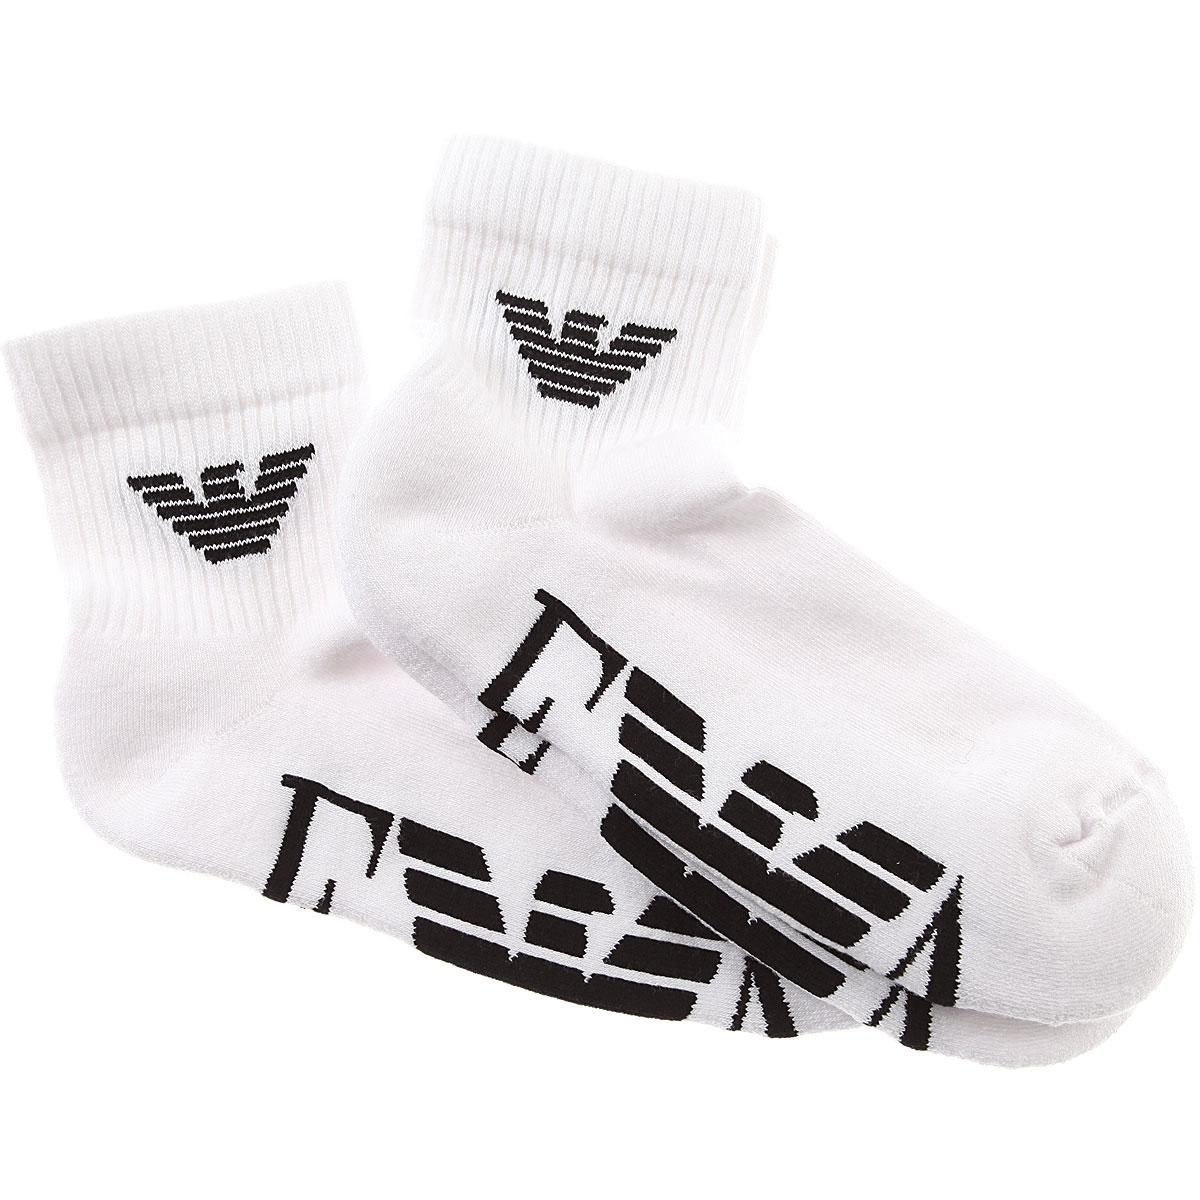 Image of Emporio Armani Socks Socks for Men, 2 Pack, White, Cotton, 2017, S - M L - XL